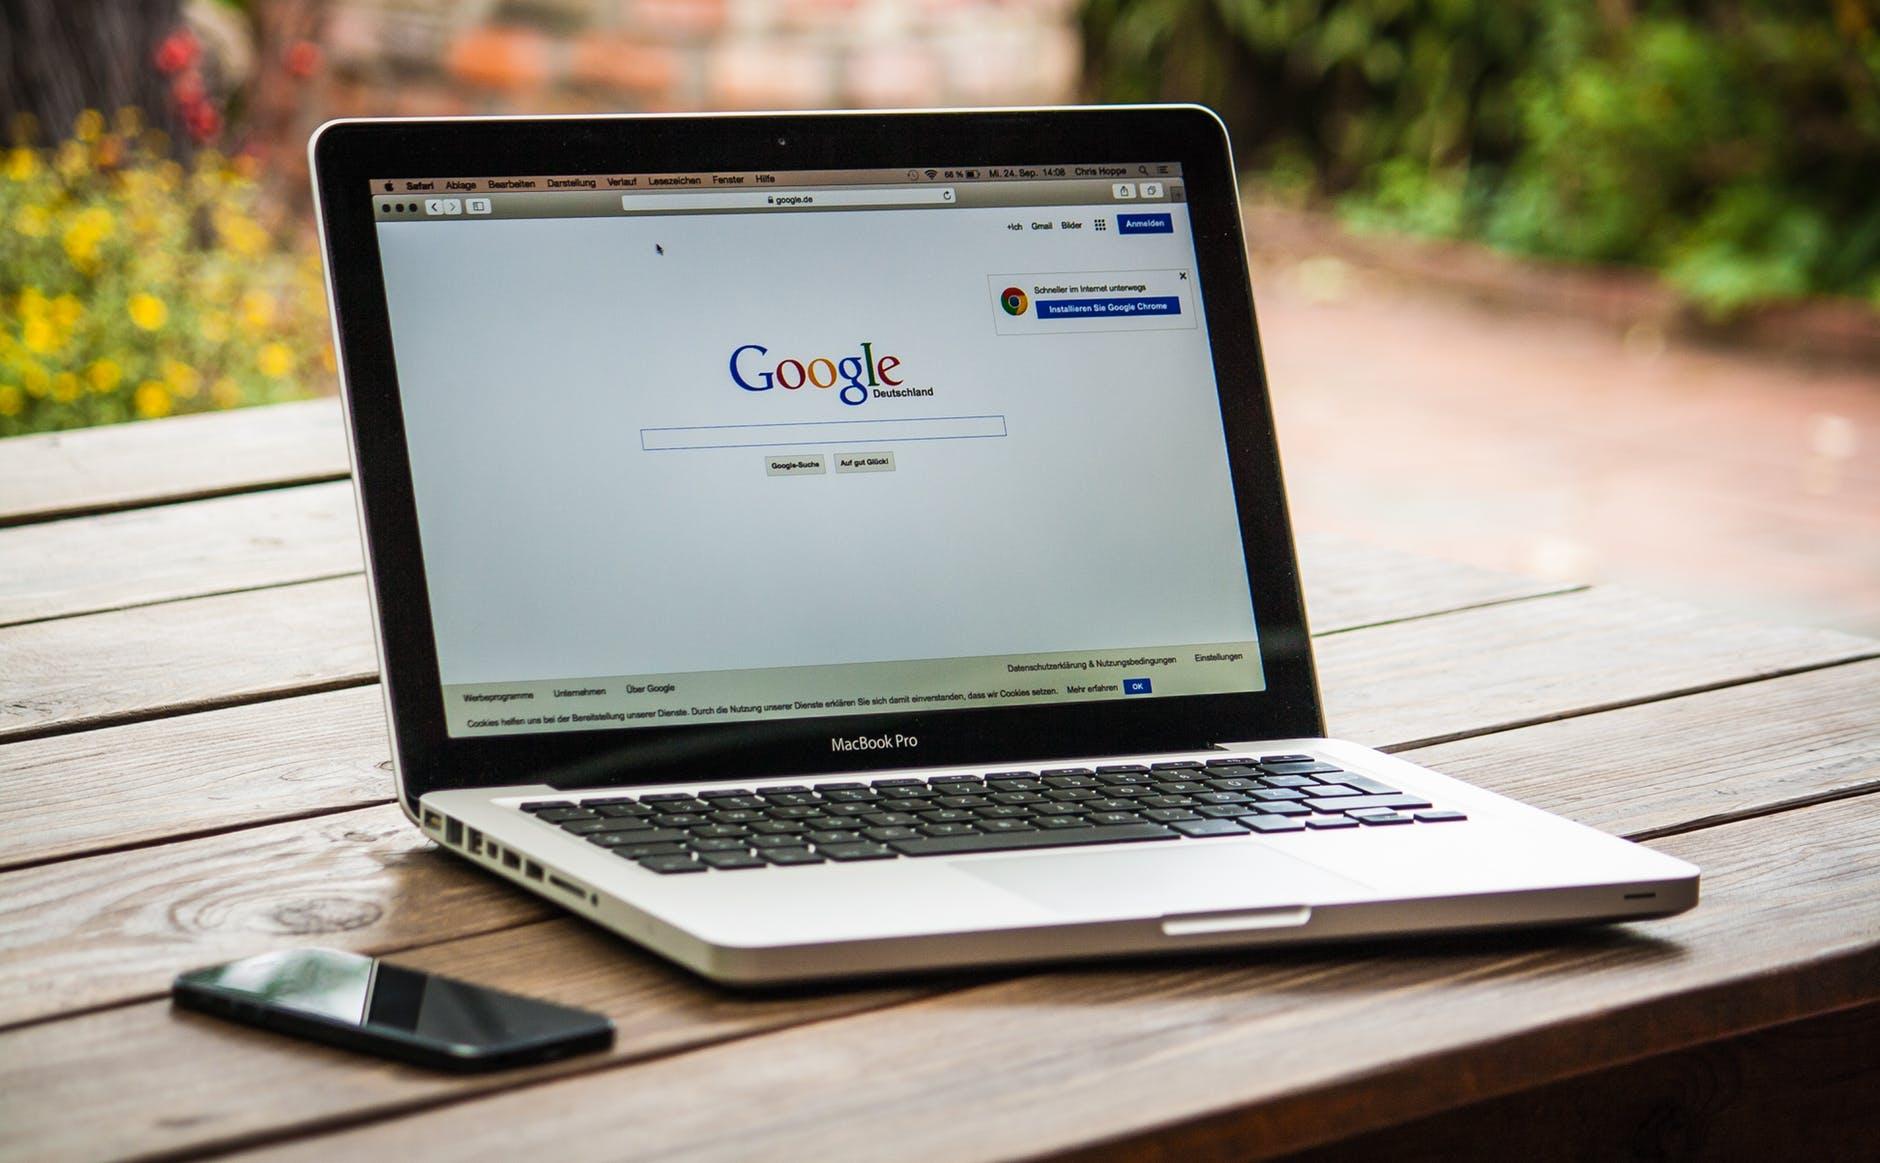 SEO Service Provider. Google Search Engine Optimization